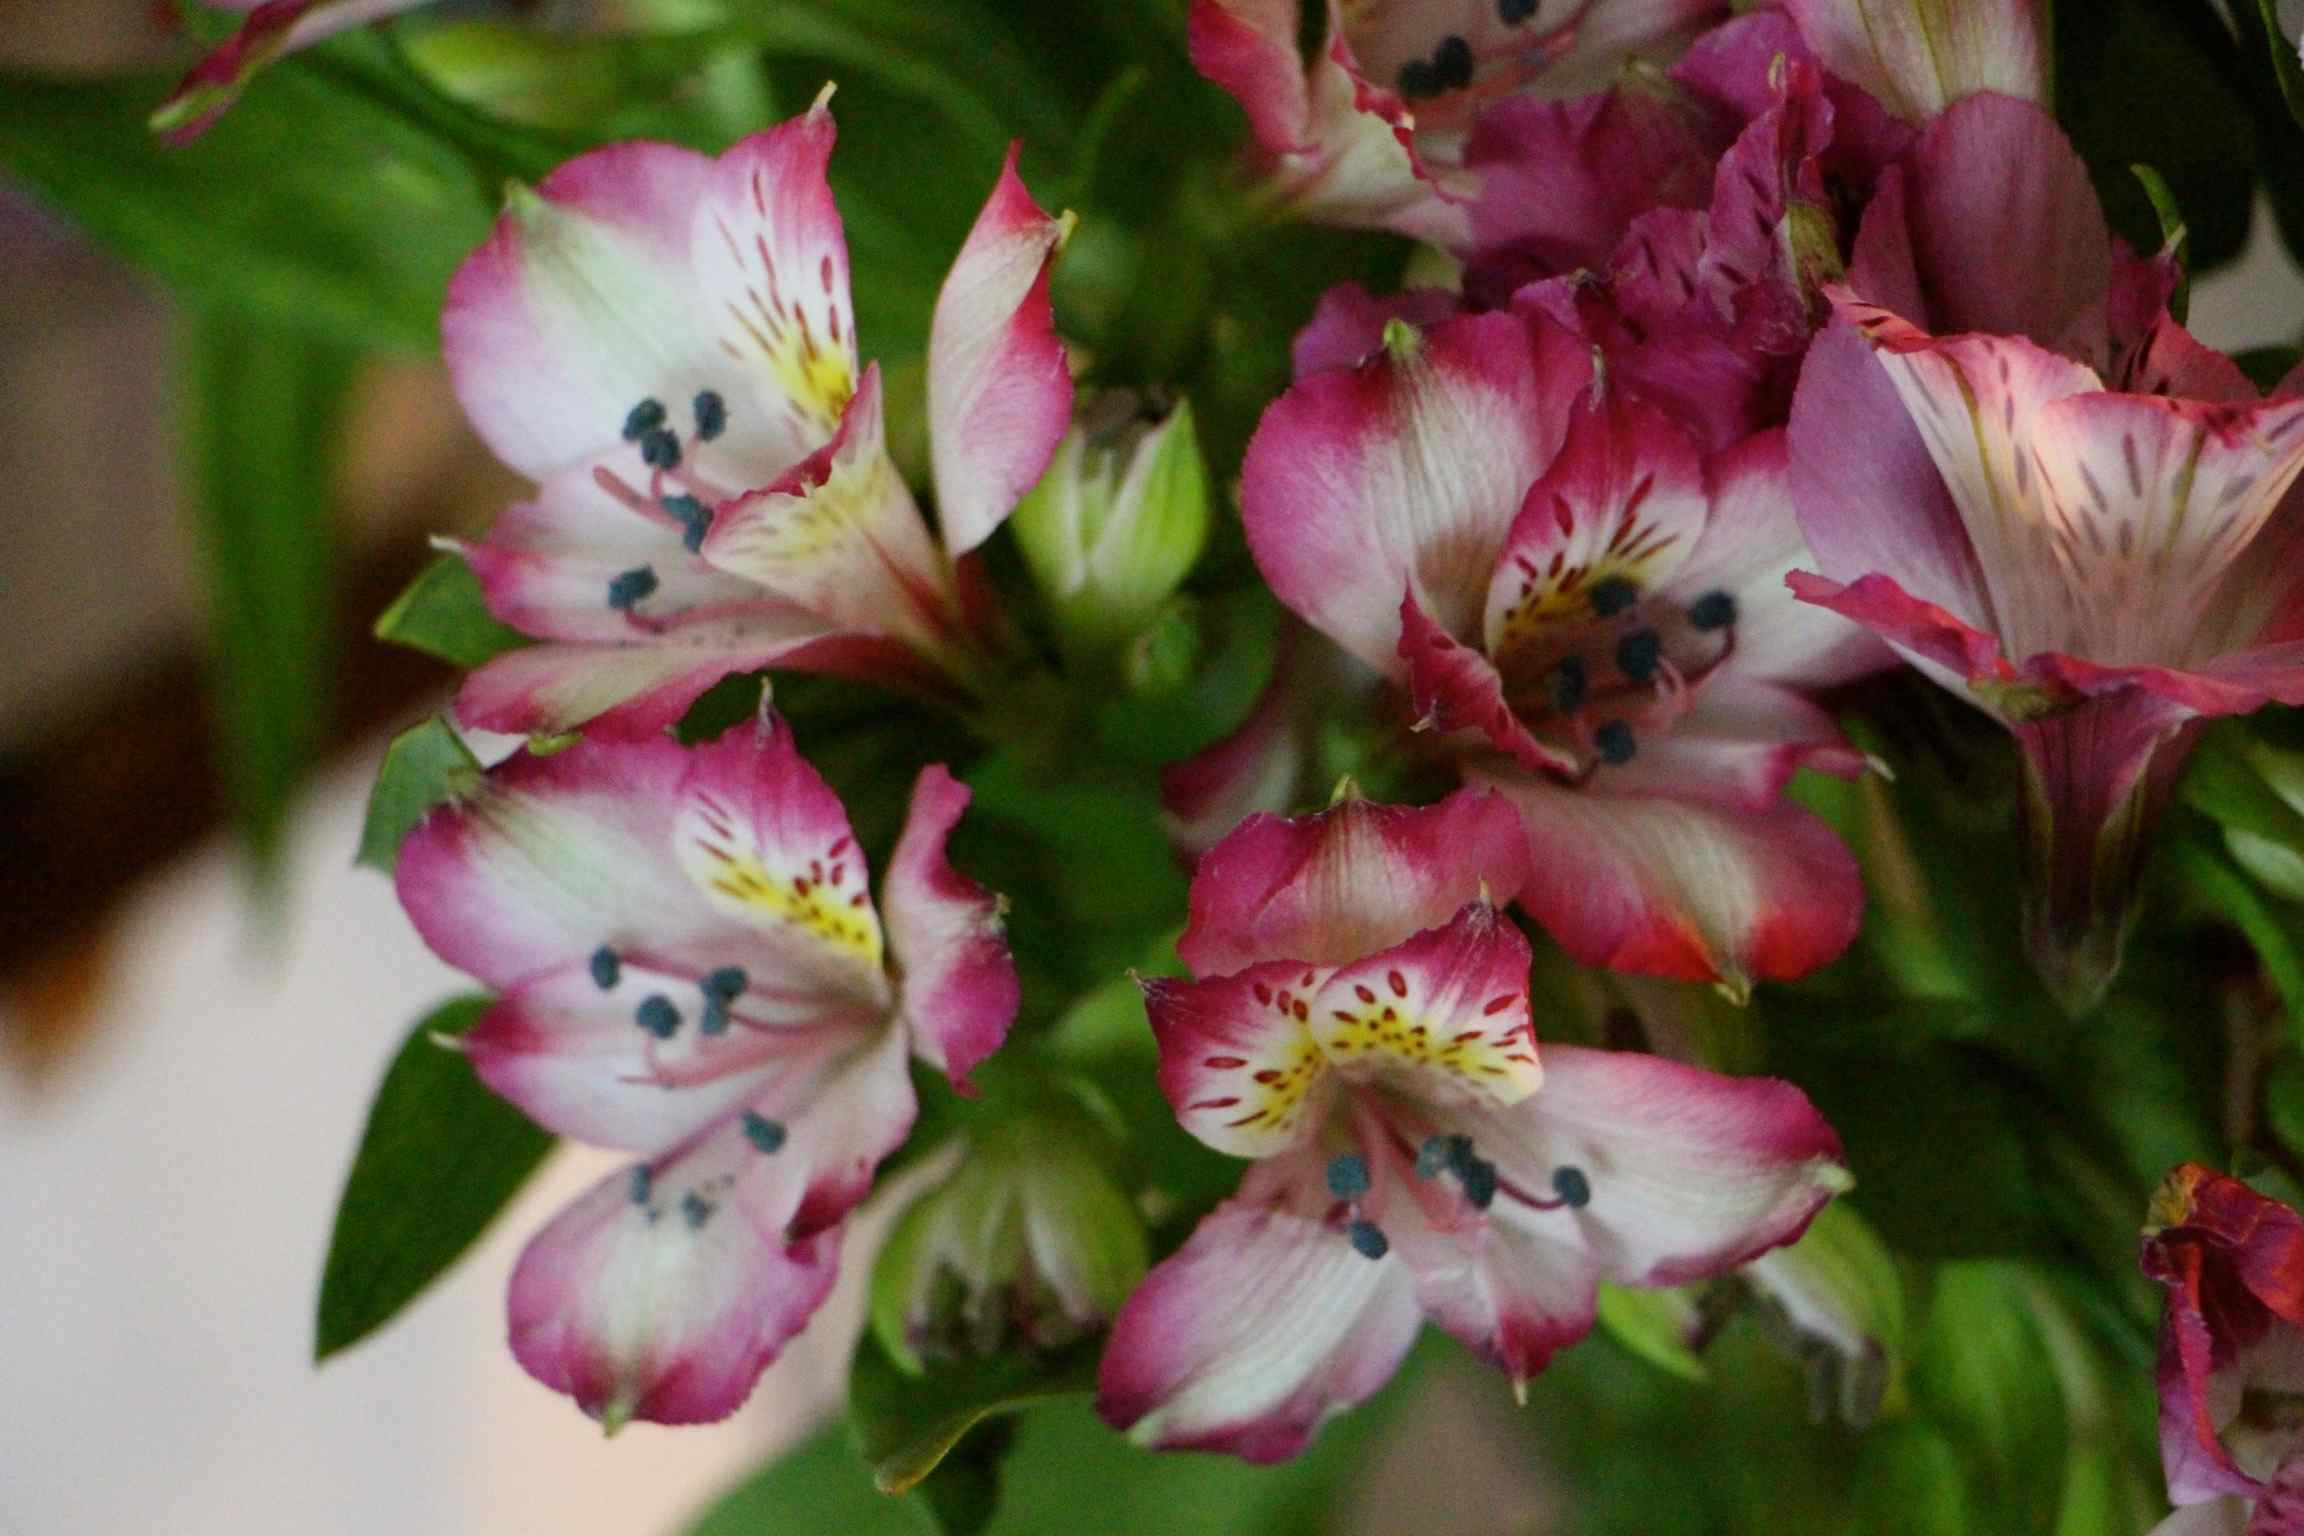 A dozen Alstroemeria flowers in bloom.